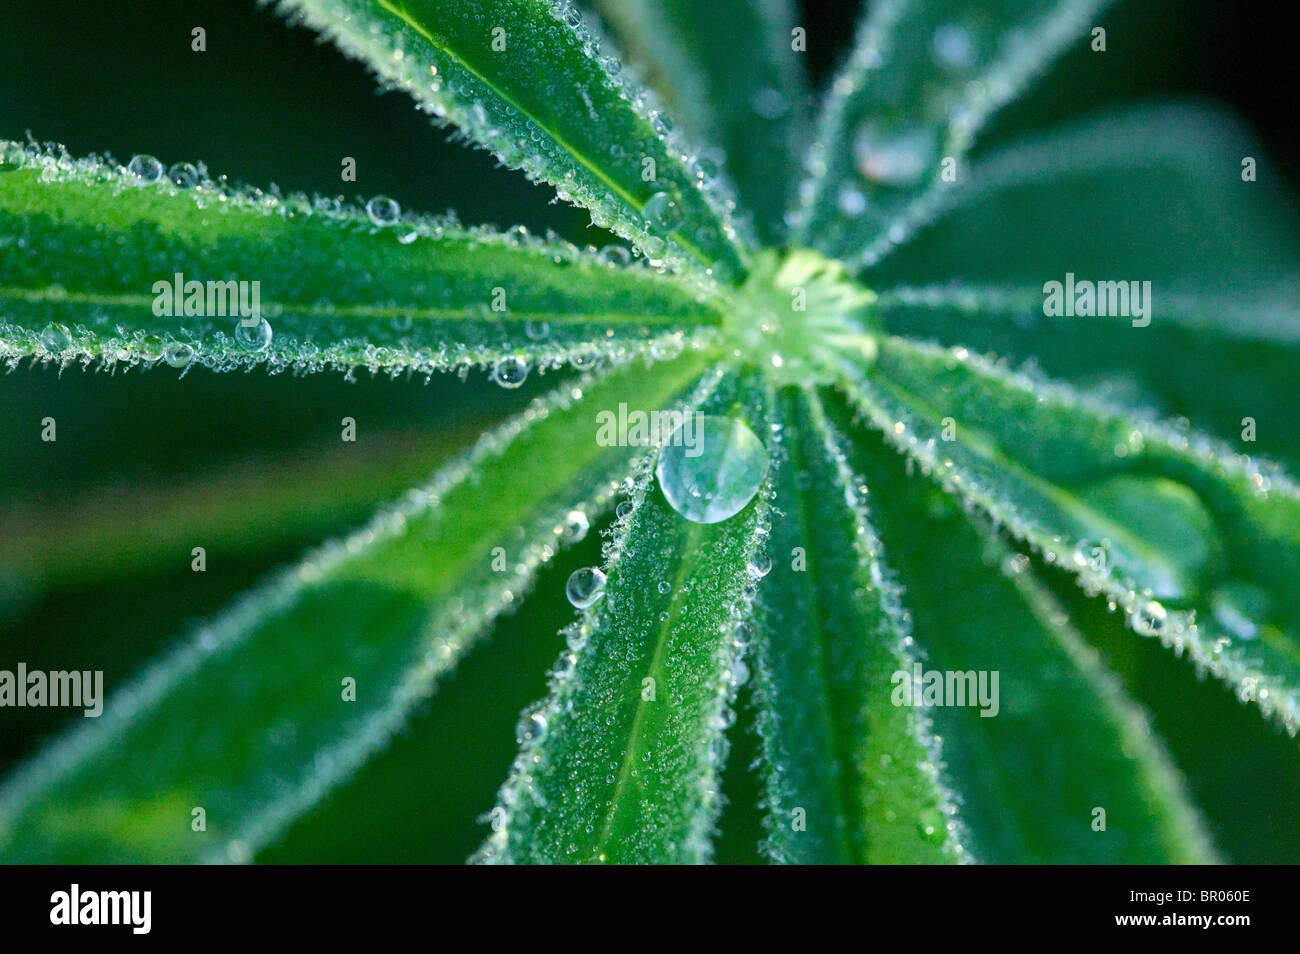 dew drop on green leaf - Stock Image